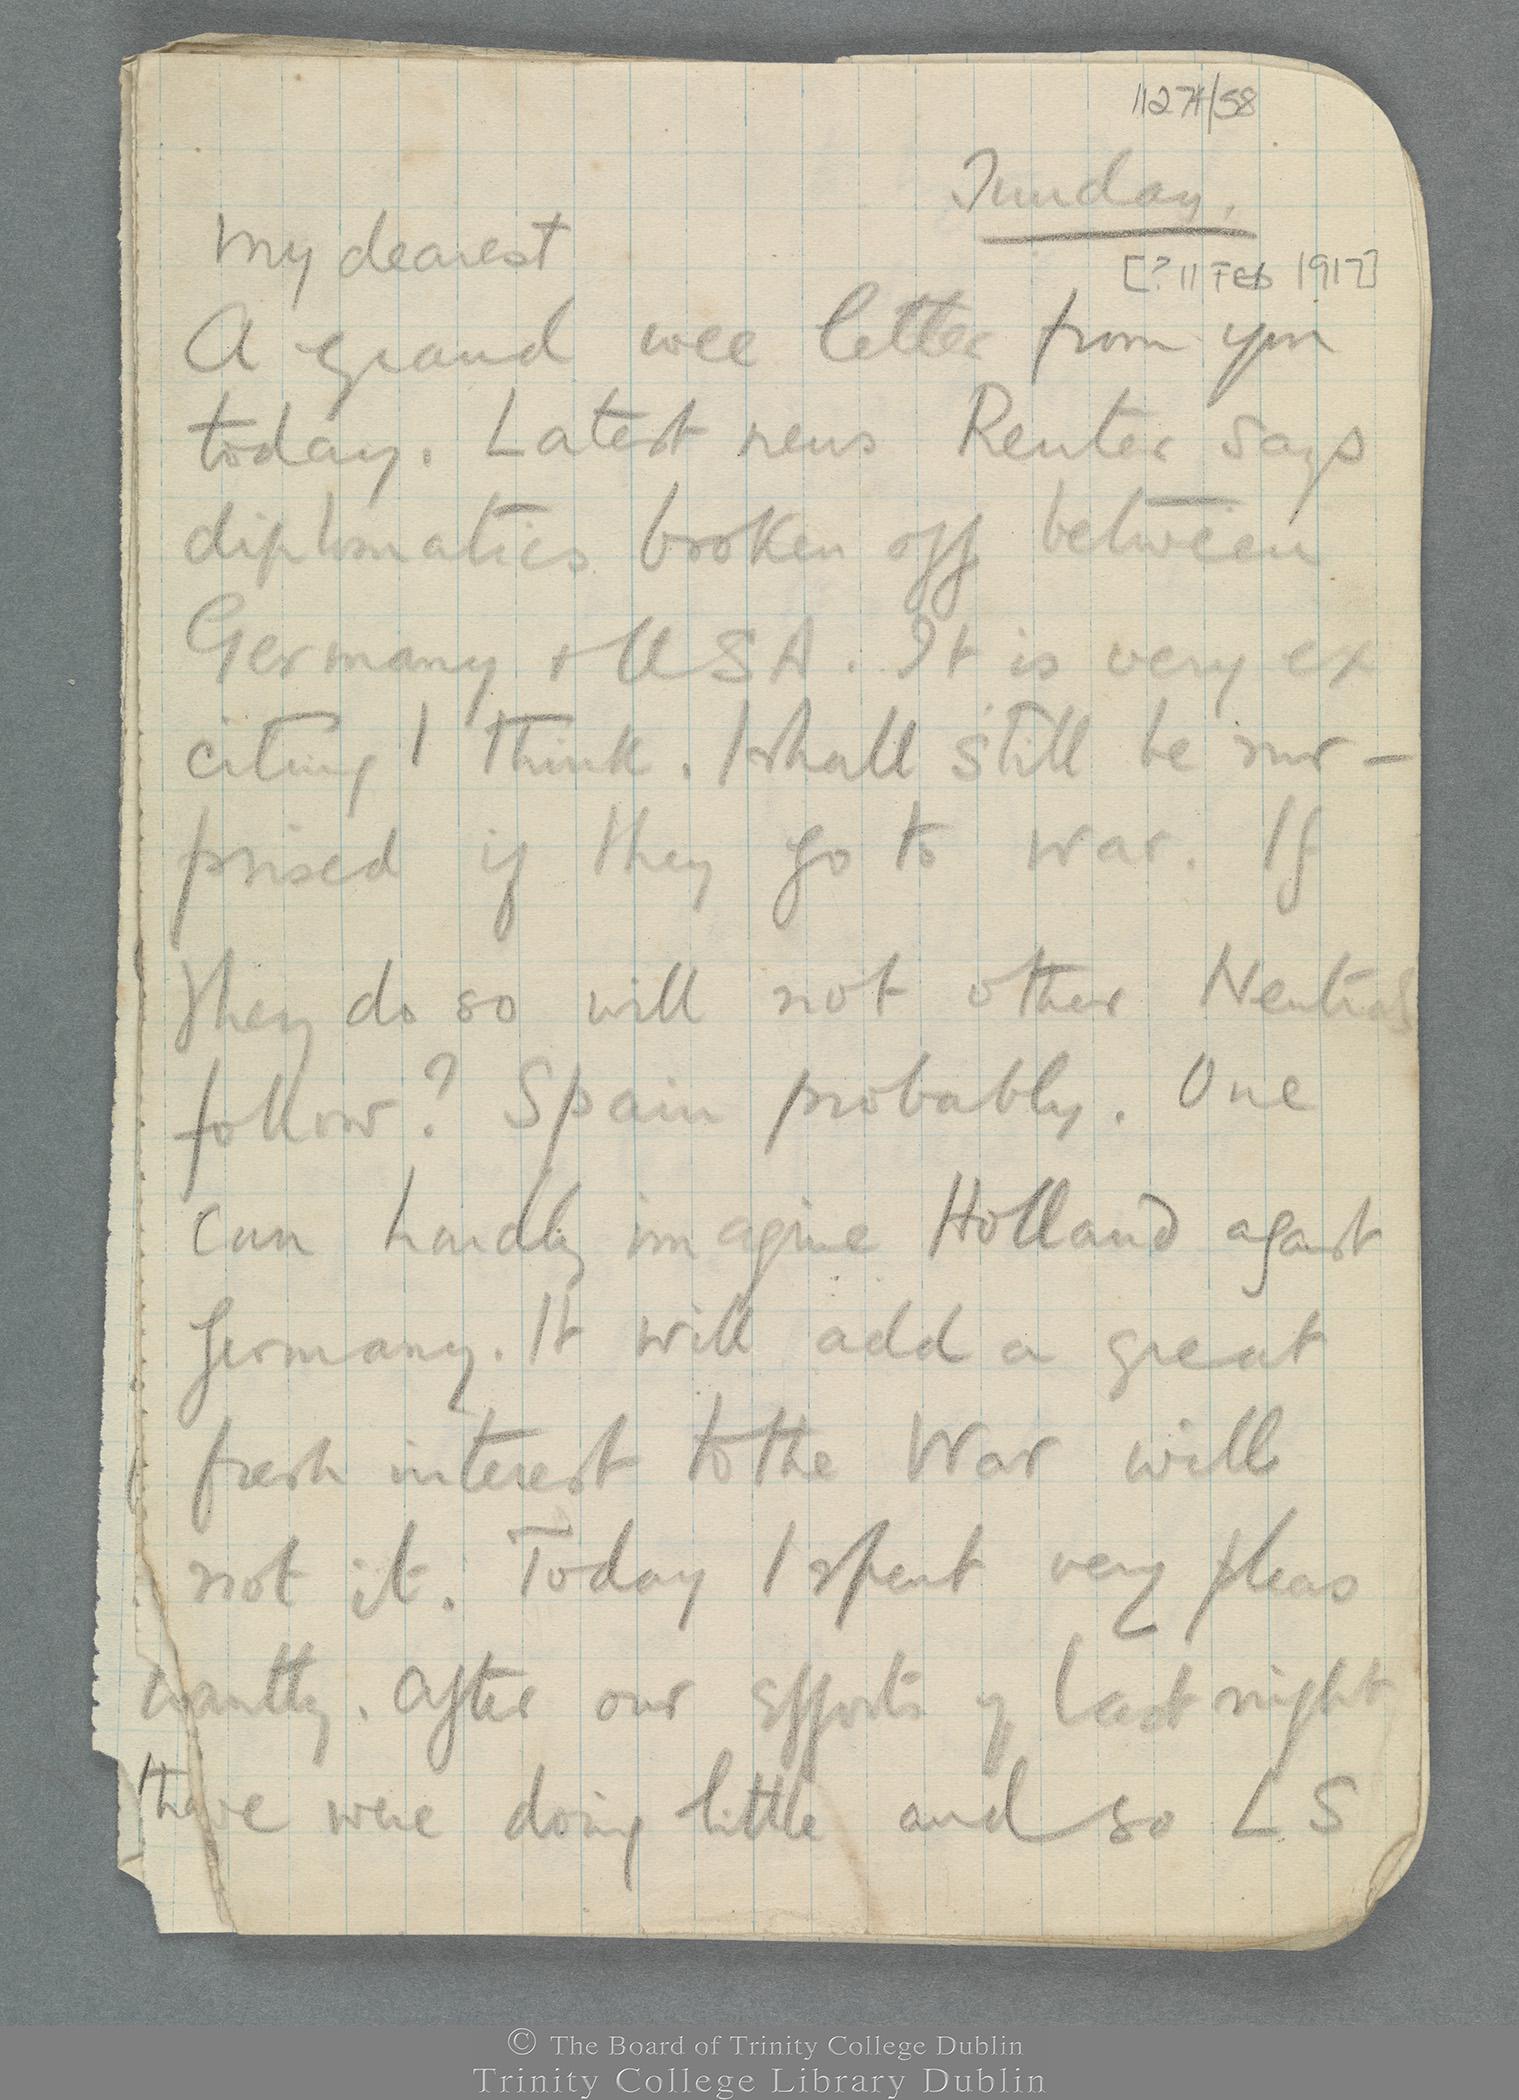 TCD MS 11274/58 folio 1 recto